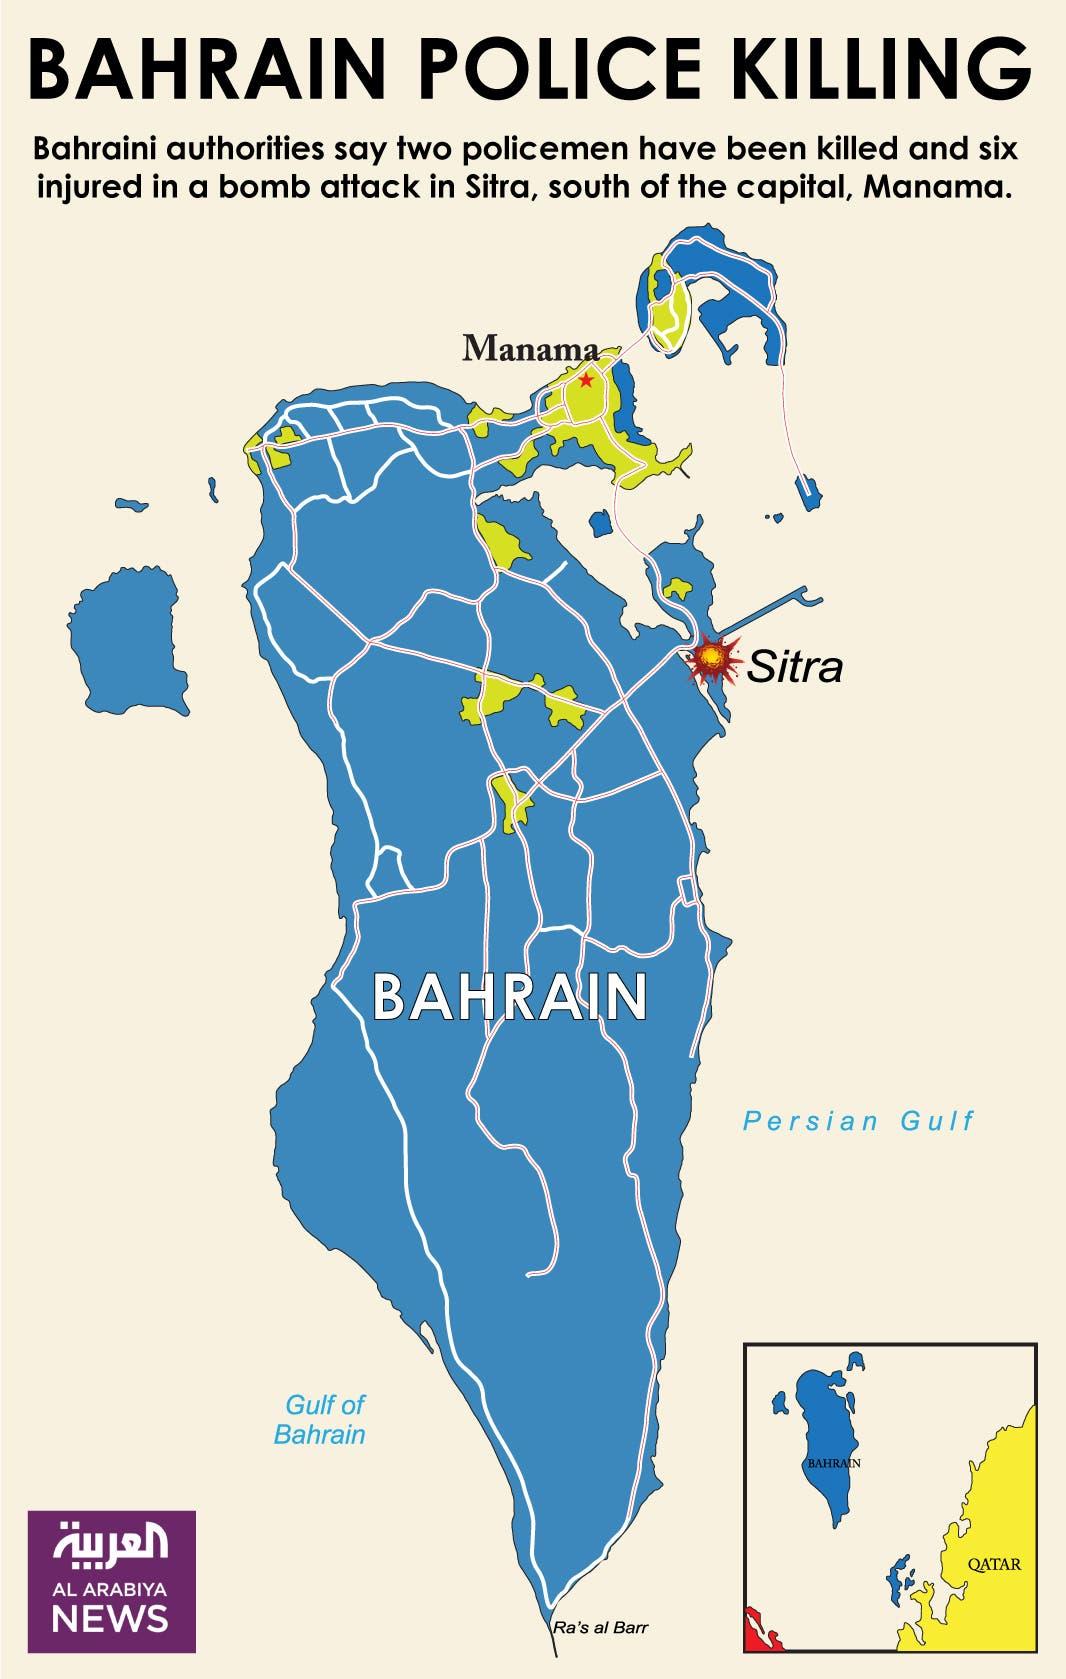 Infographic: Bahrain police killing